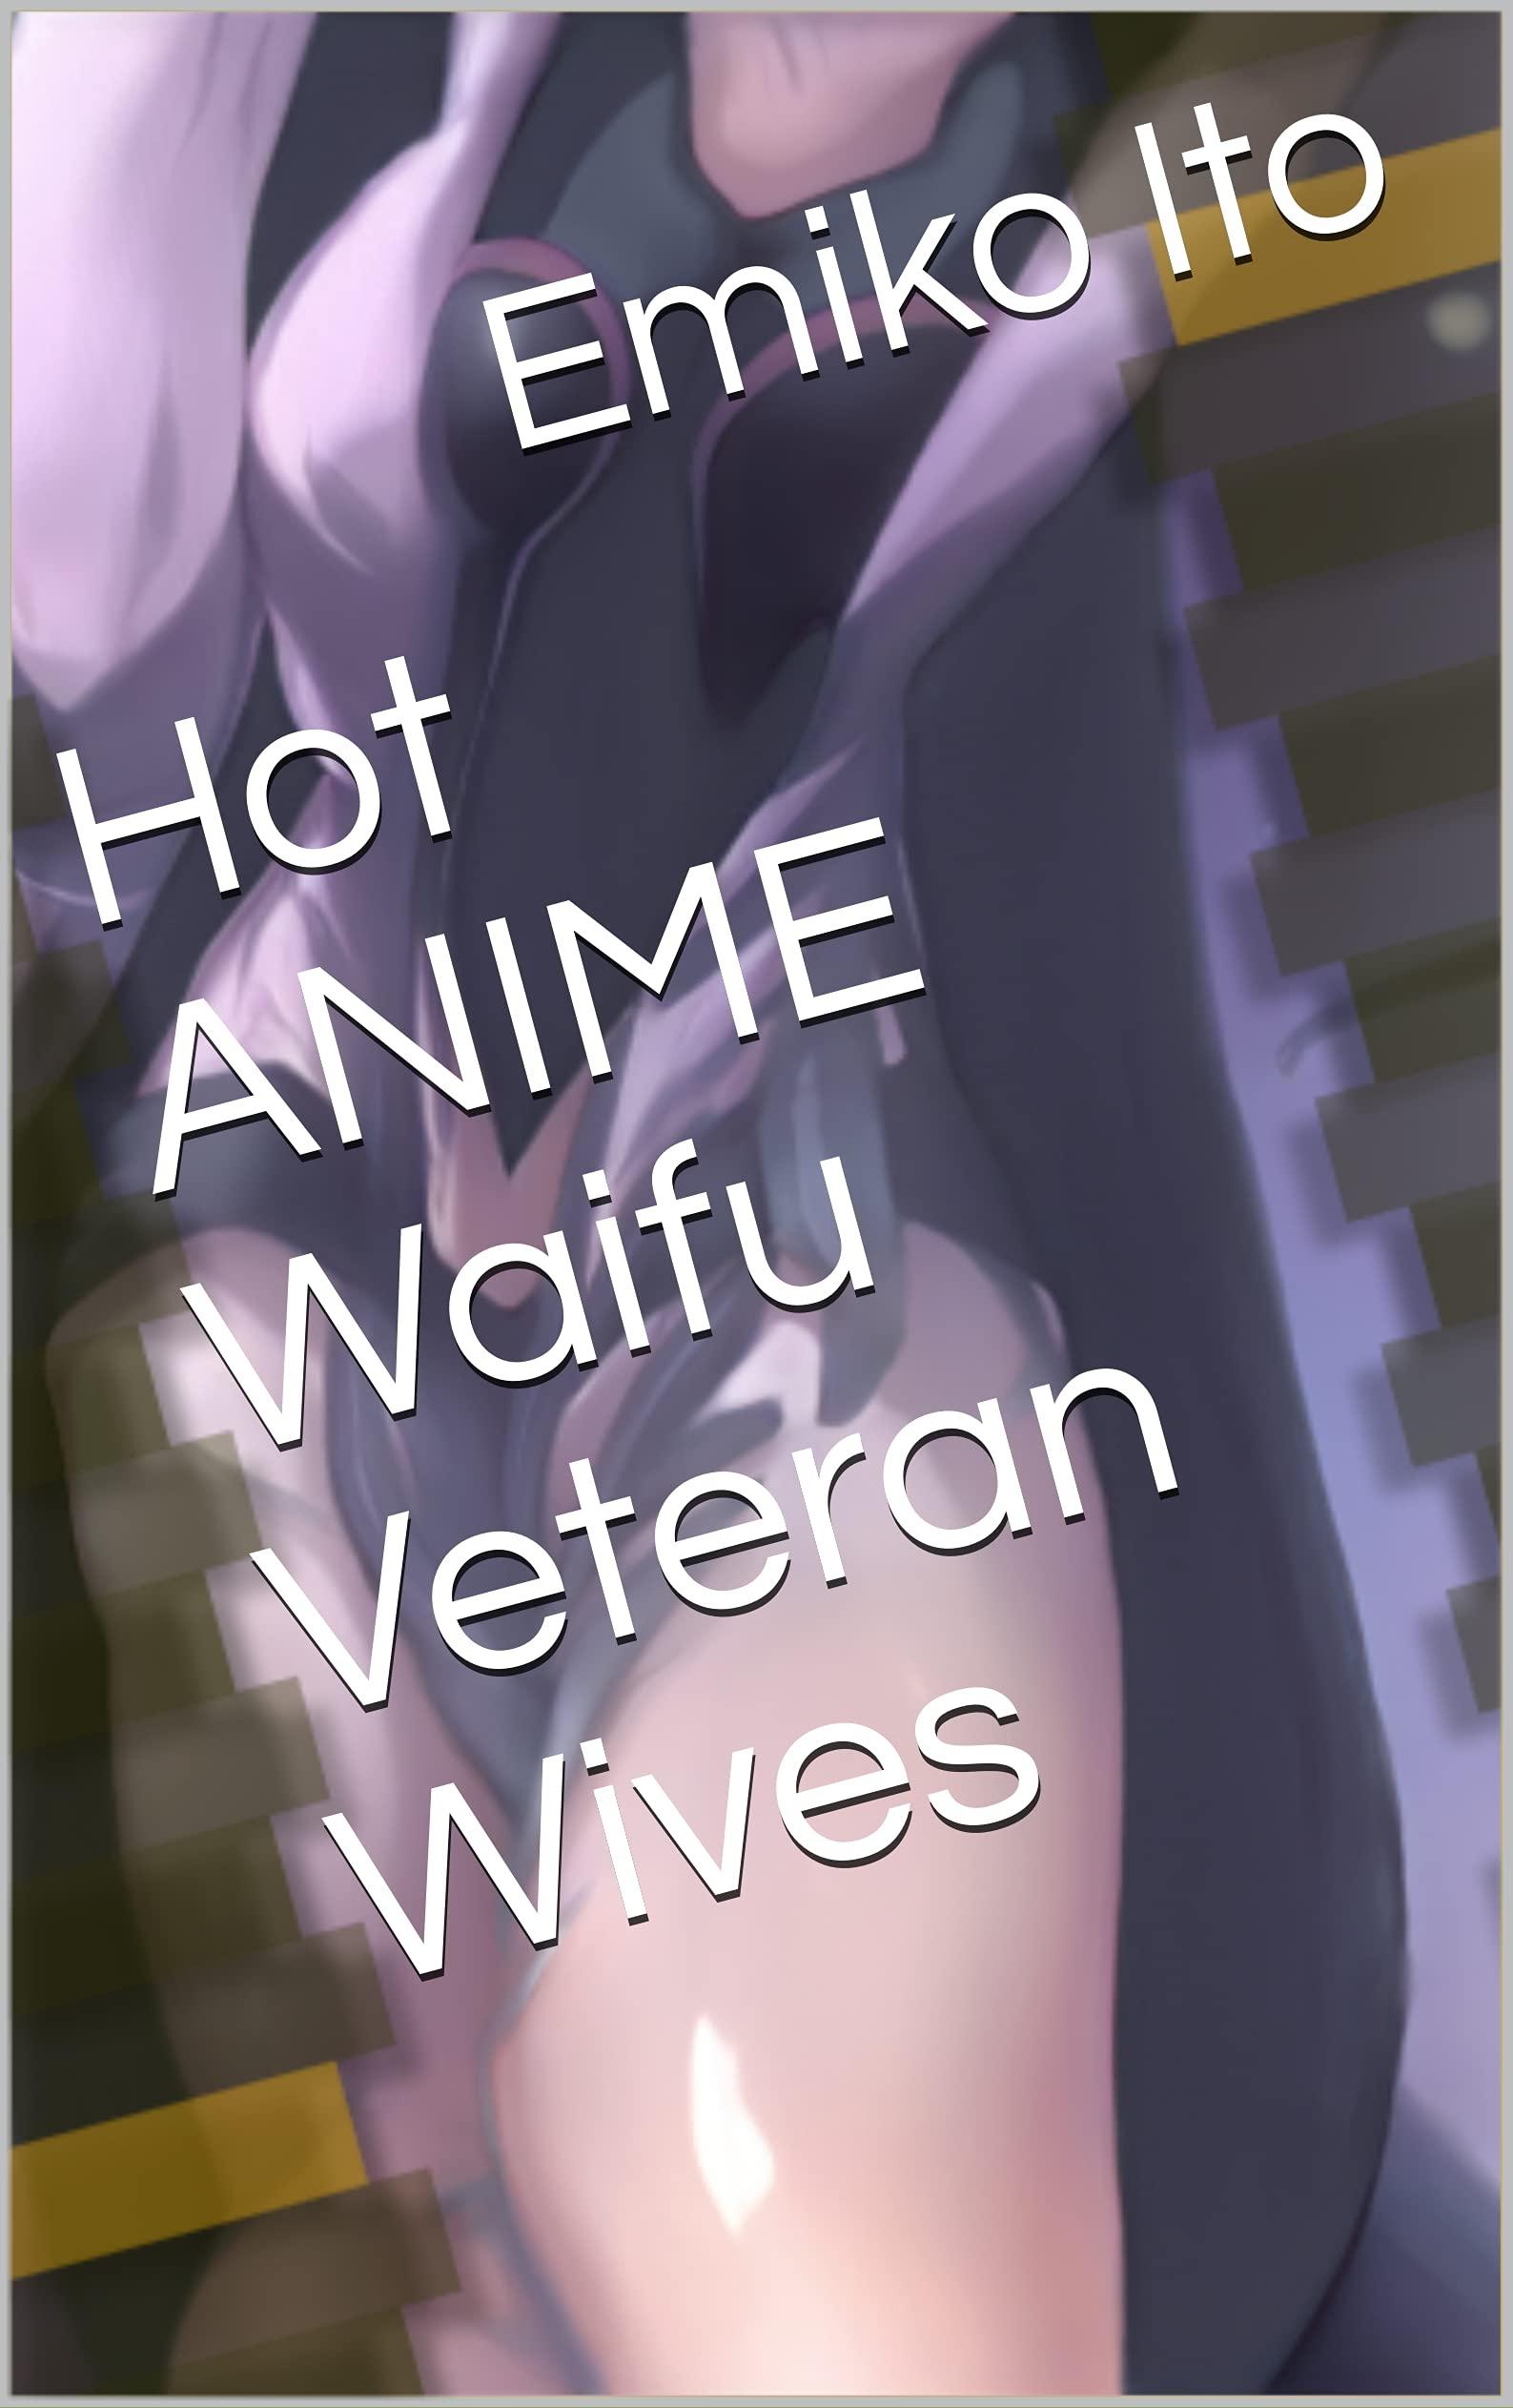 Hot ANIME Waifu Veteran Wives